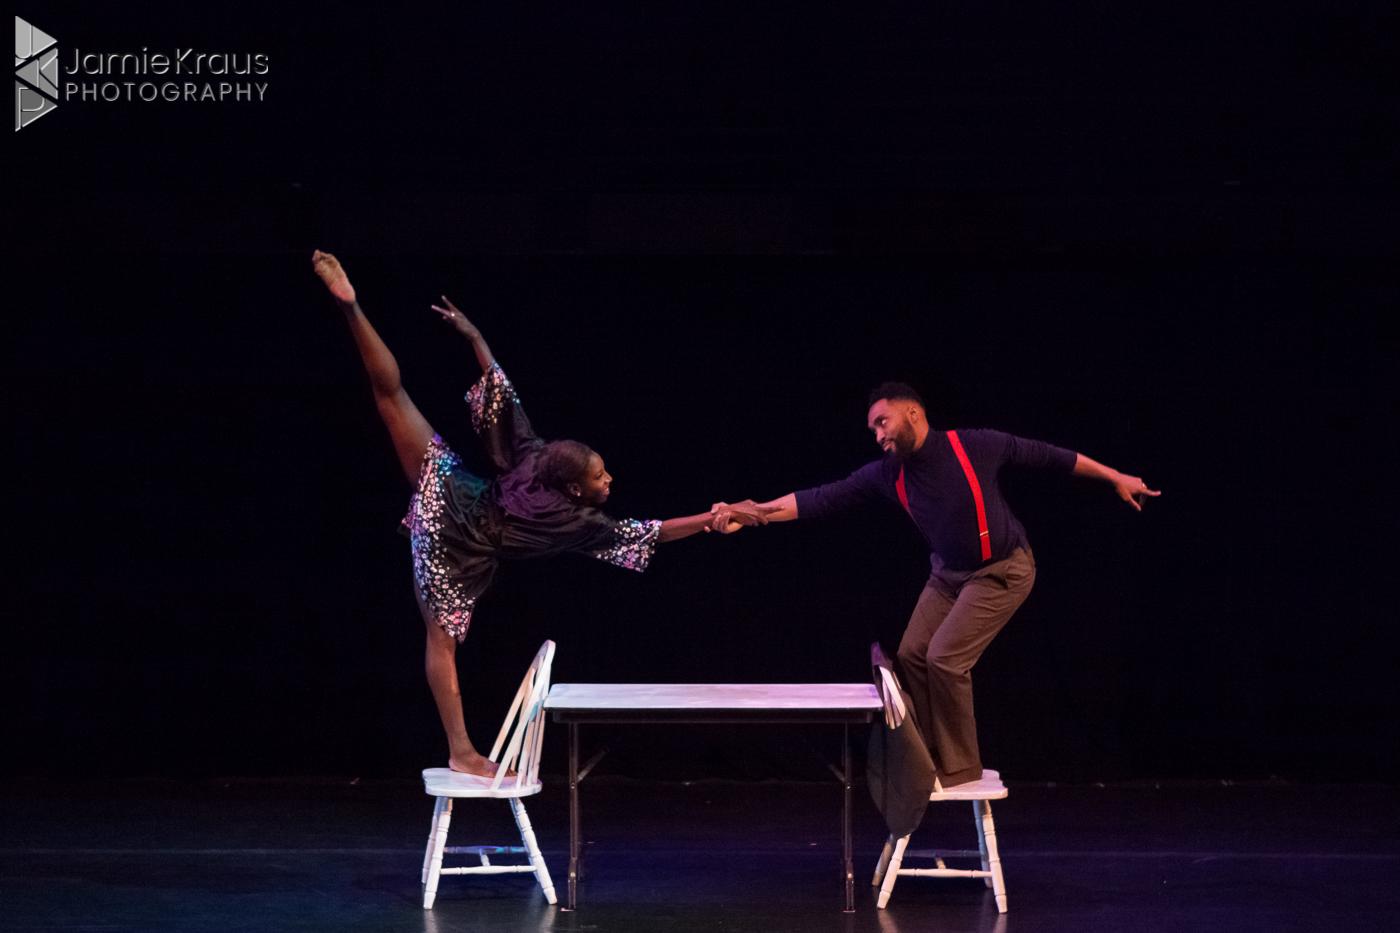 denver dance festival photography